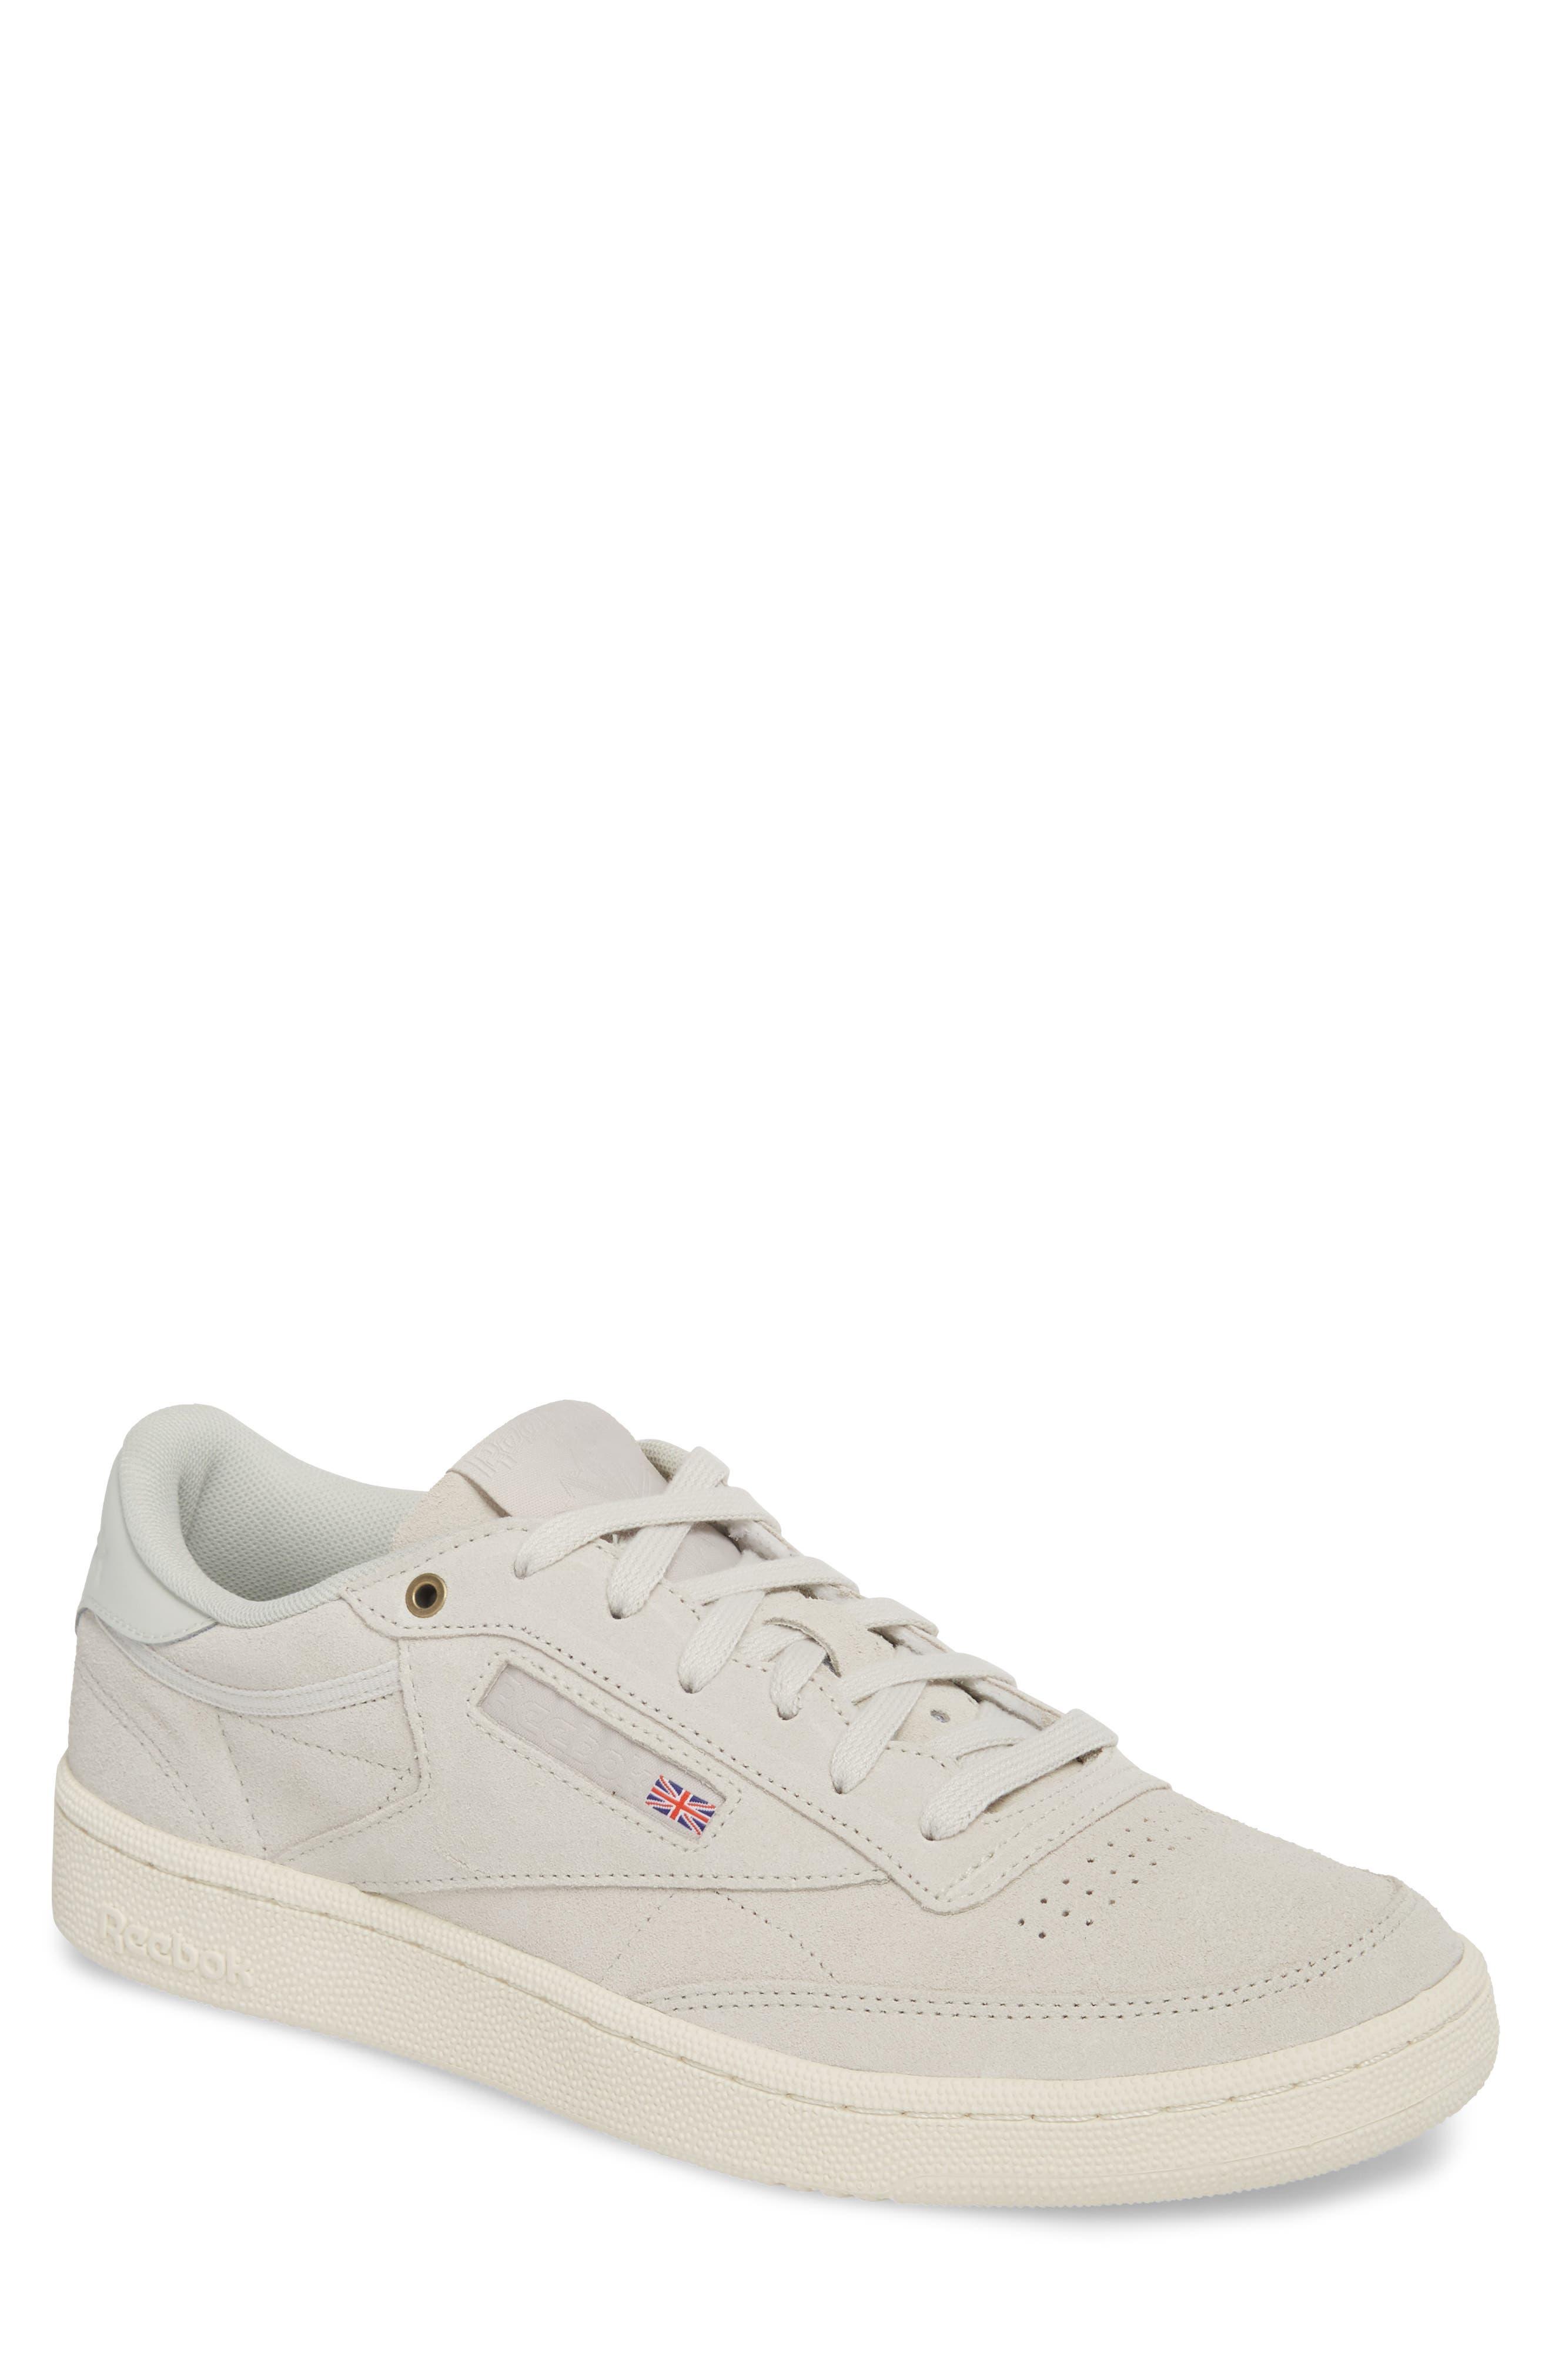 Club C 85 MCC Sneaker,                             Main thumbnail 1, color,                             020